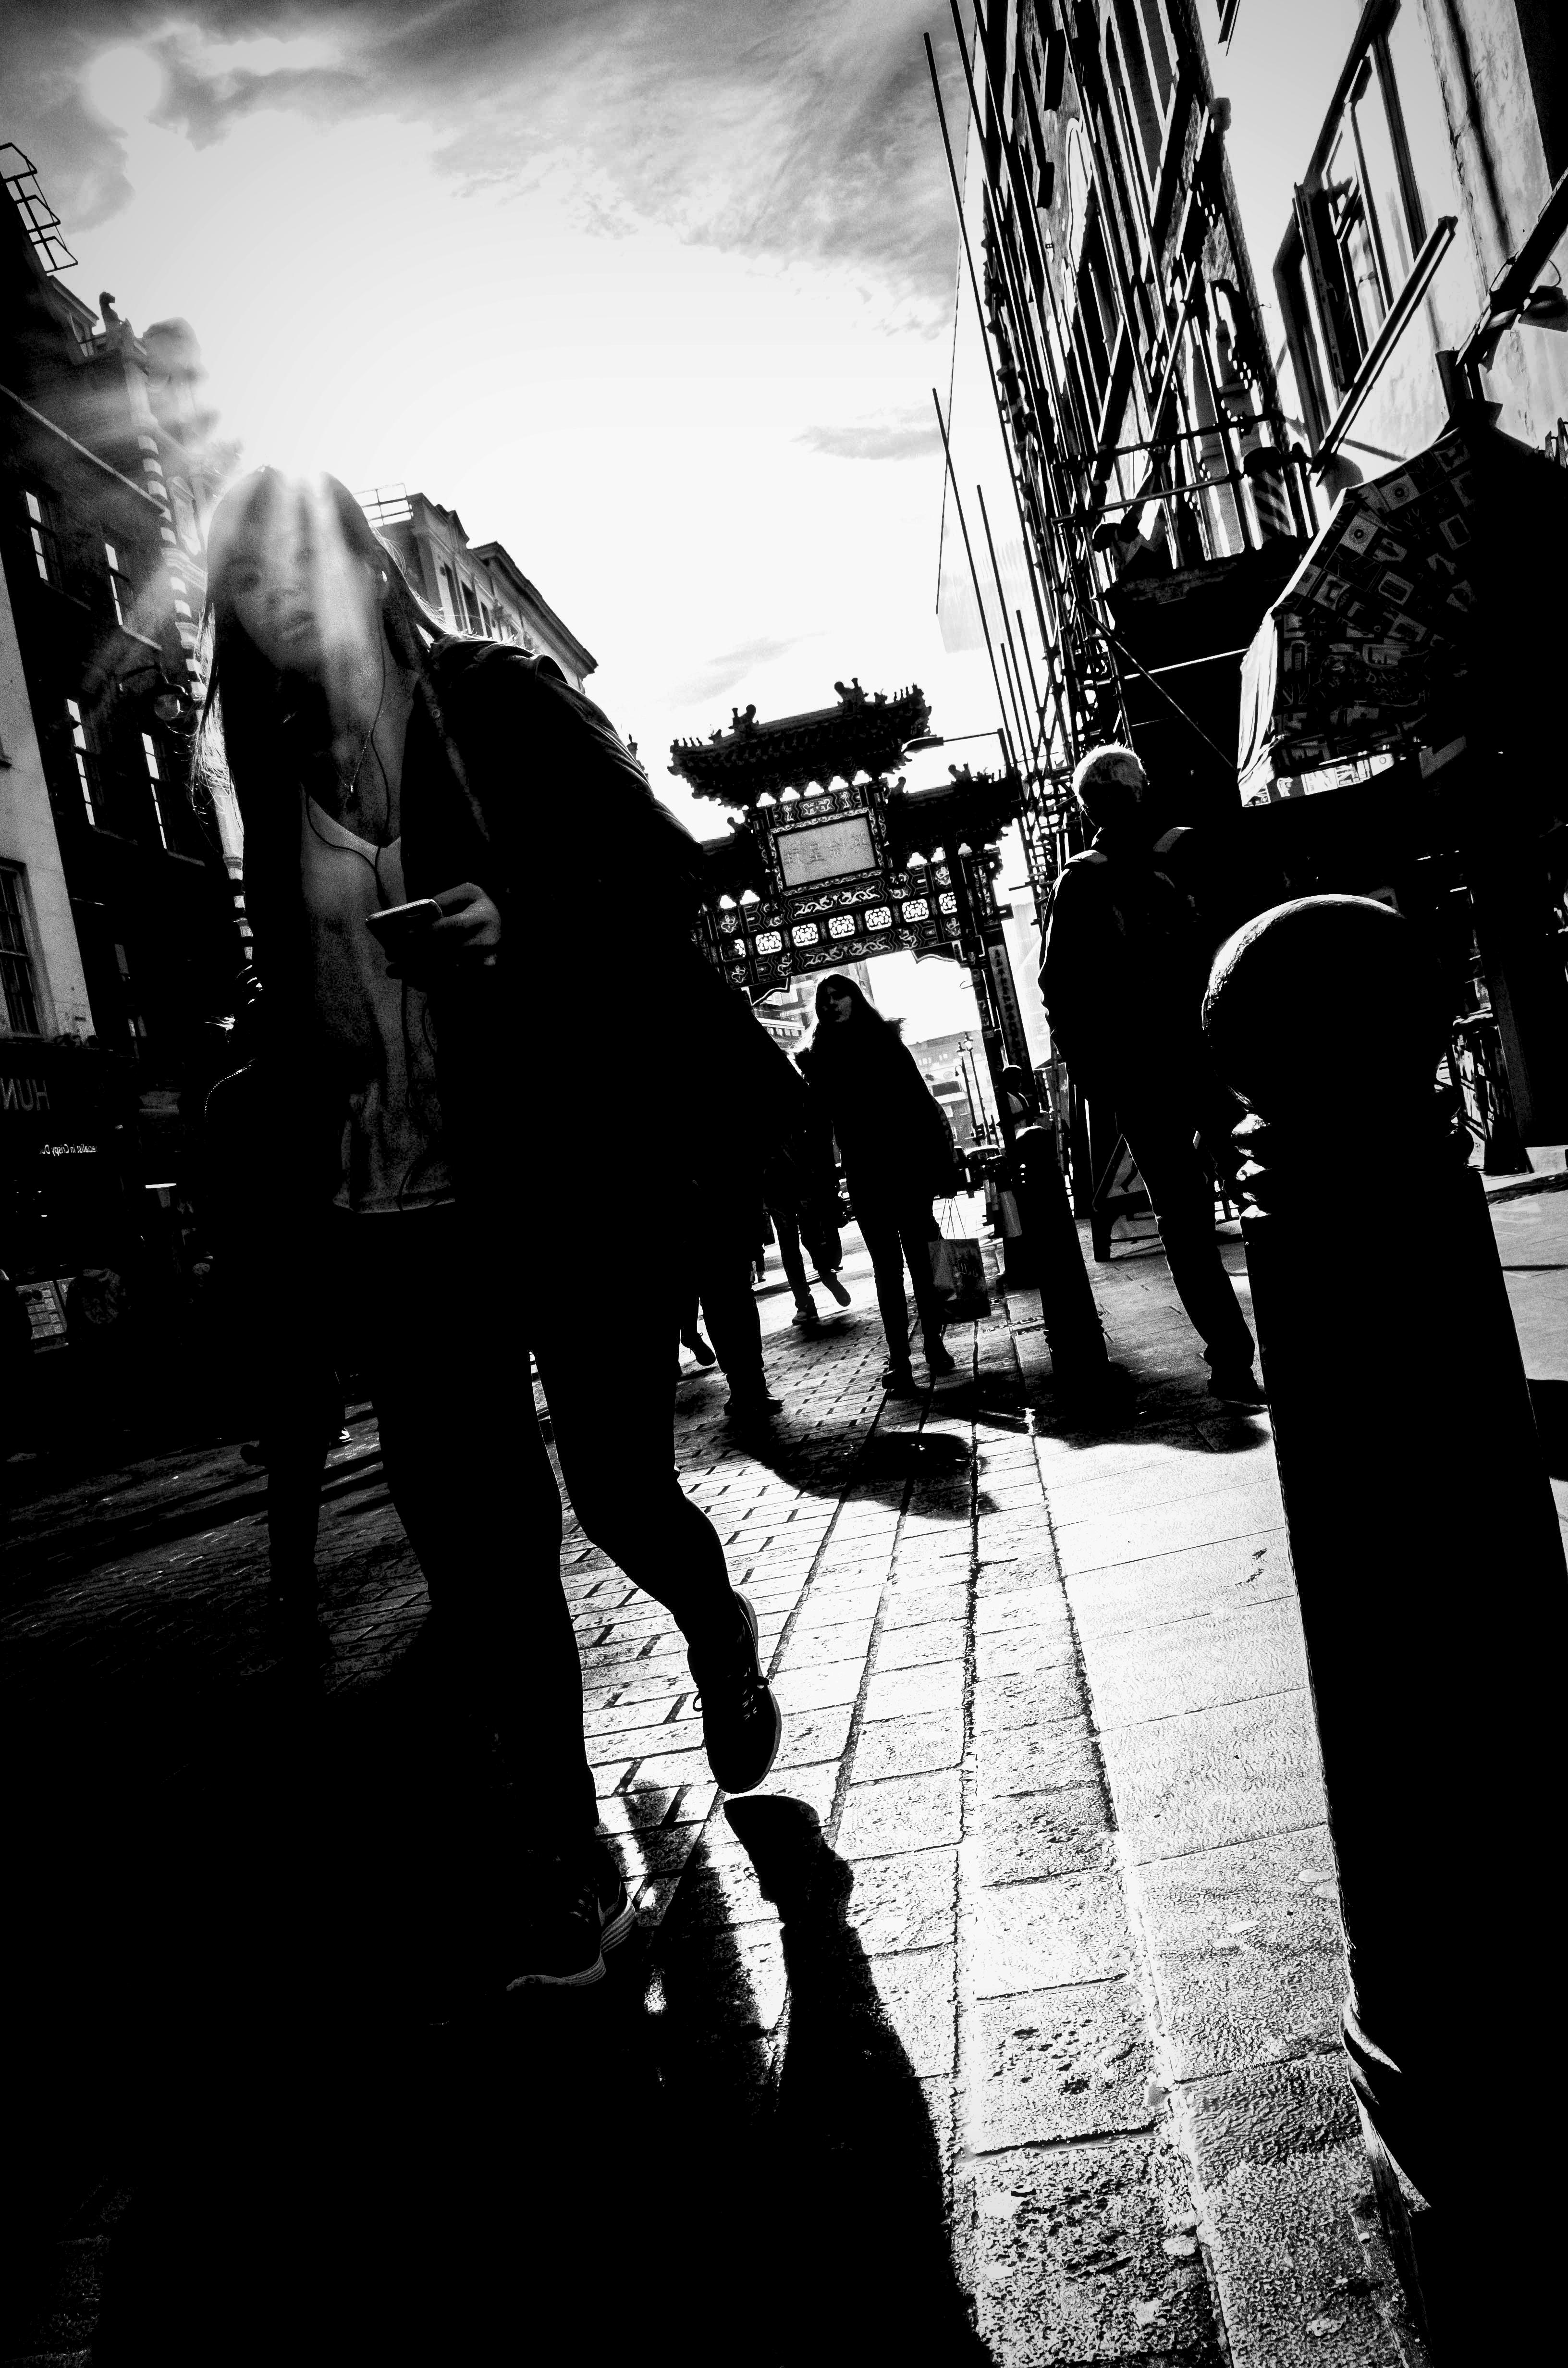 Chinatown, London, October 2016